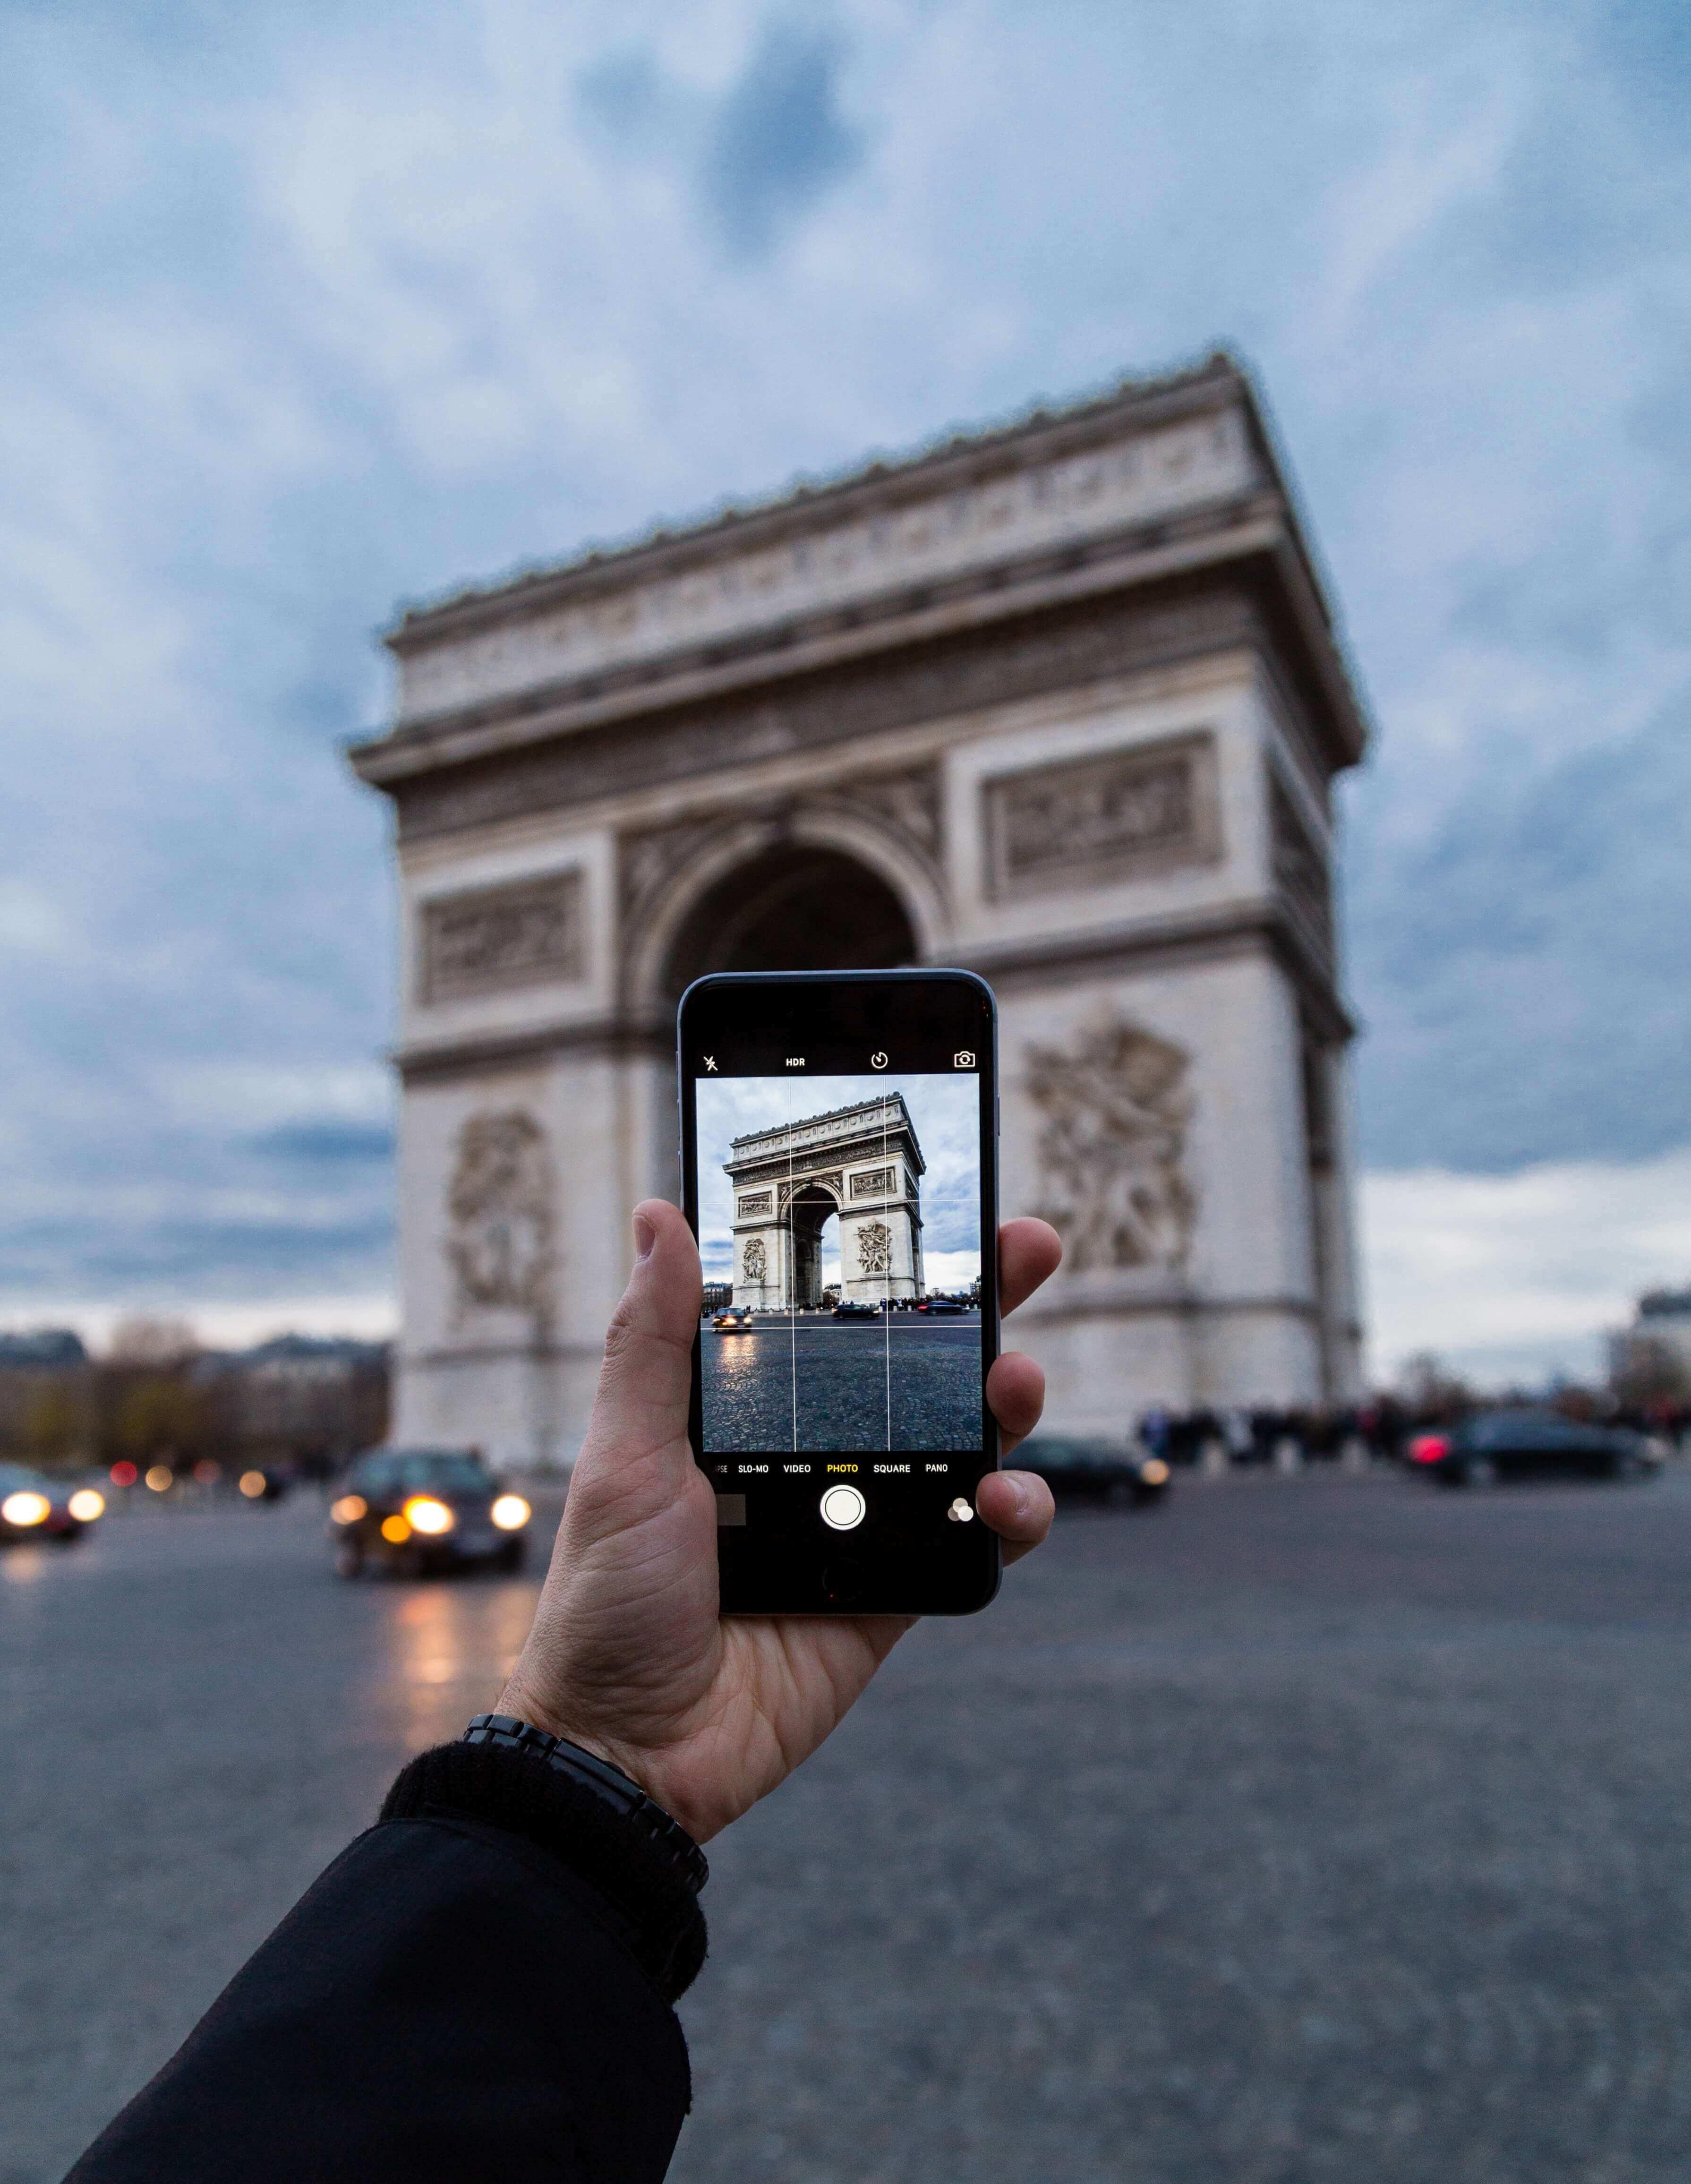 europa-celular-arcodel-triunfo-paris